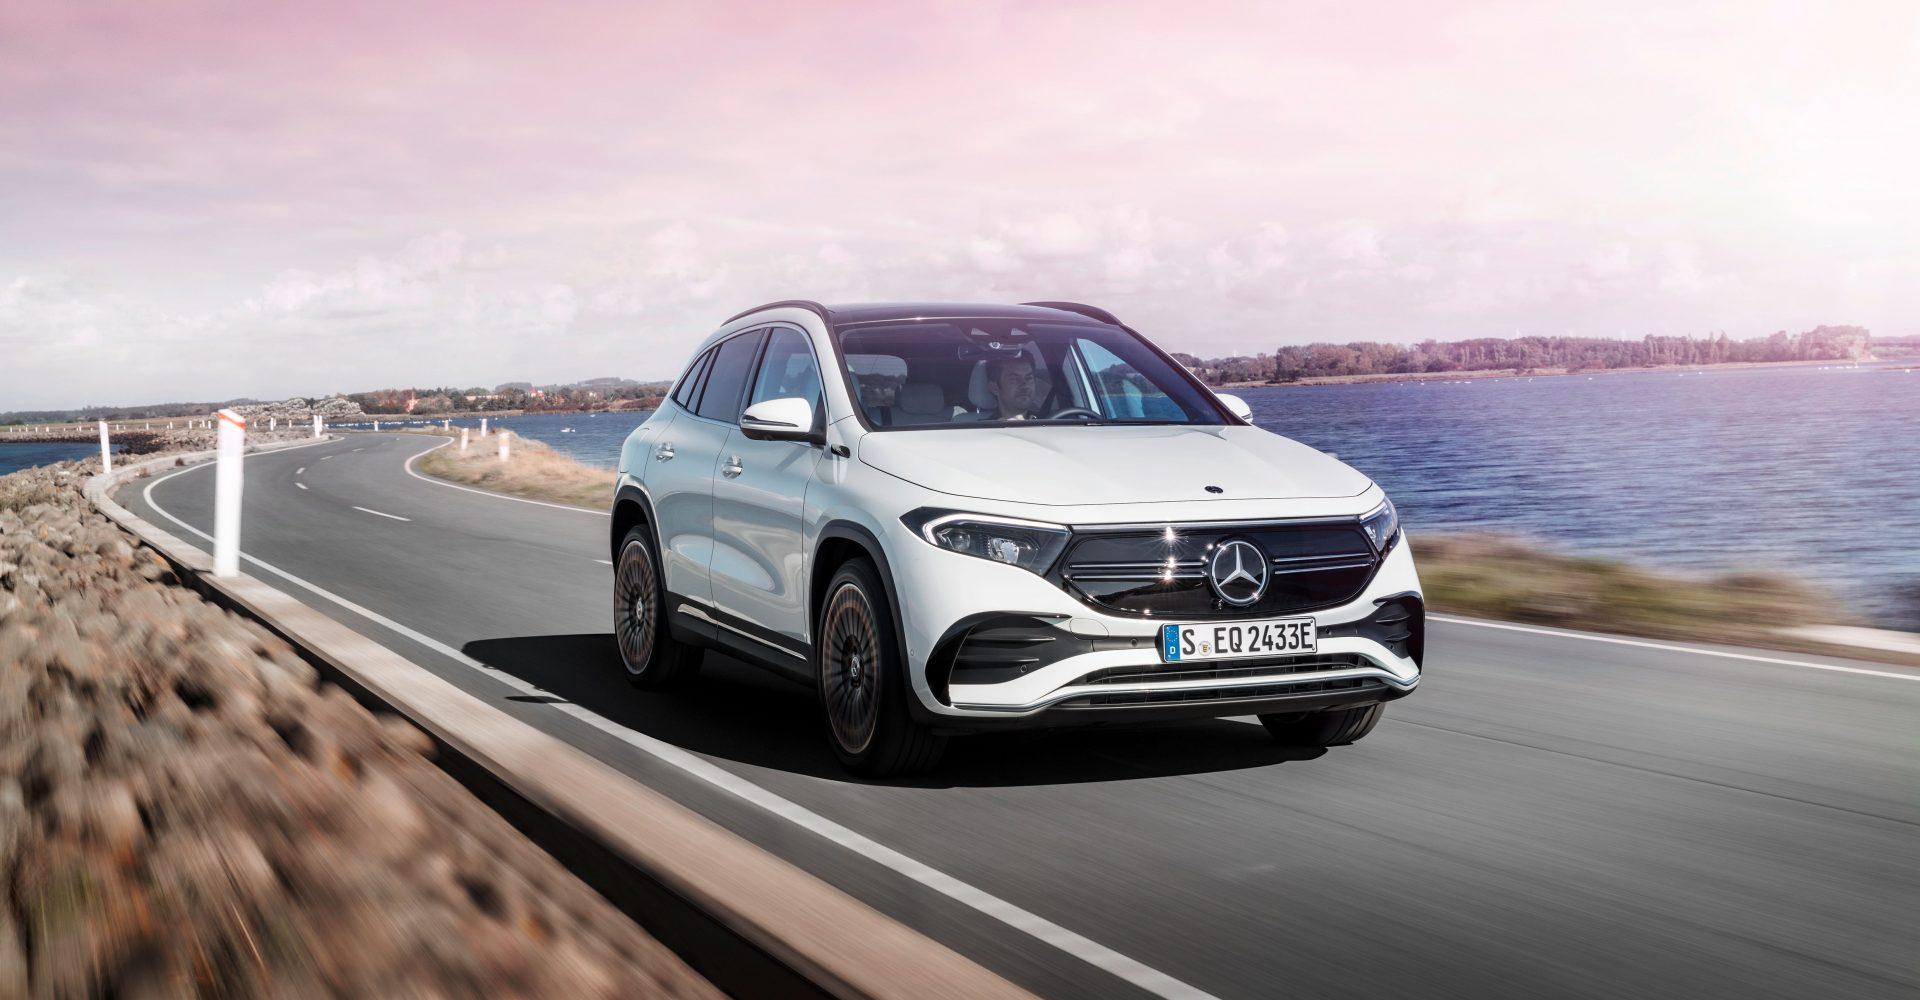 Mercedes-Benz reveals new entry-level EV called EQA